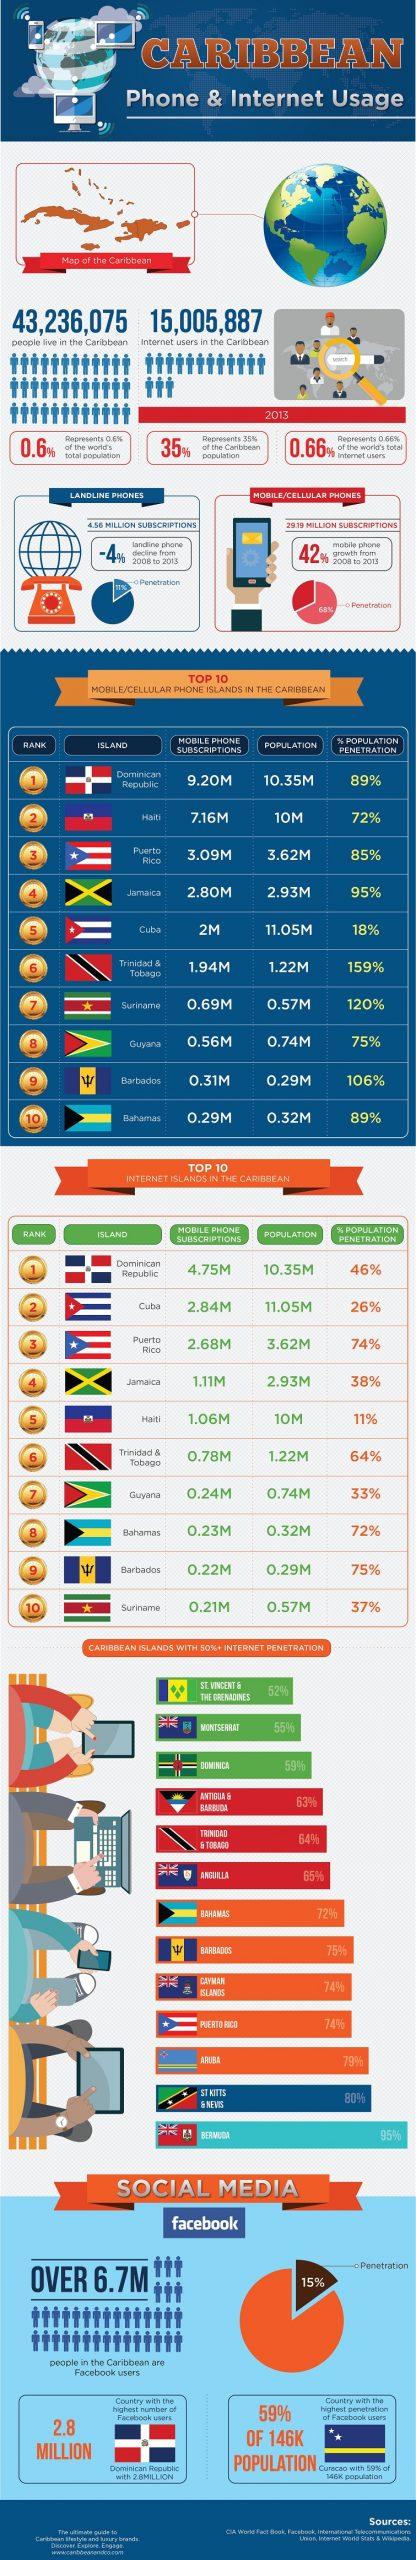 Caribbean Phone & Internet Usage